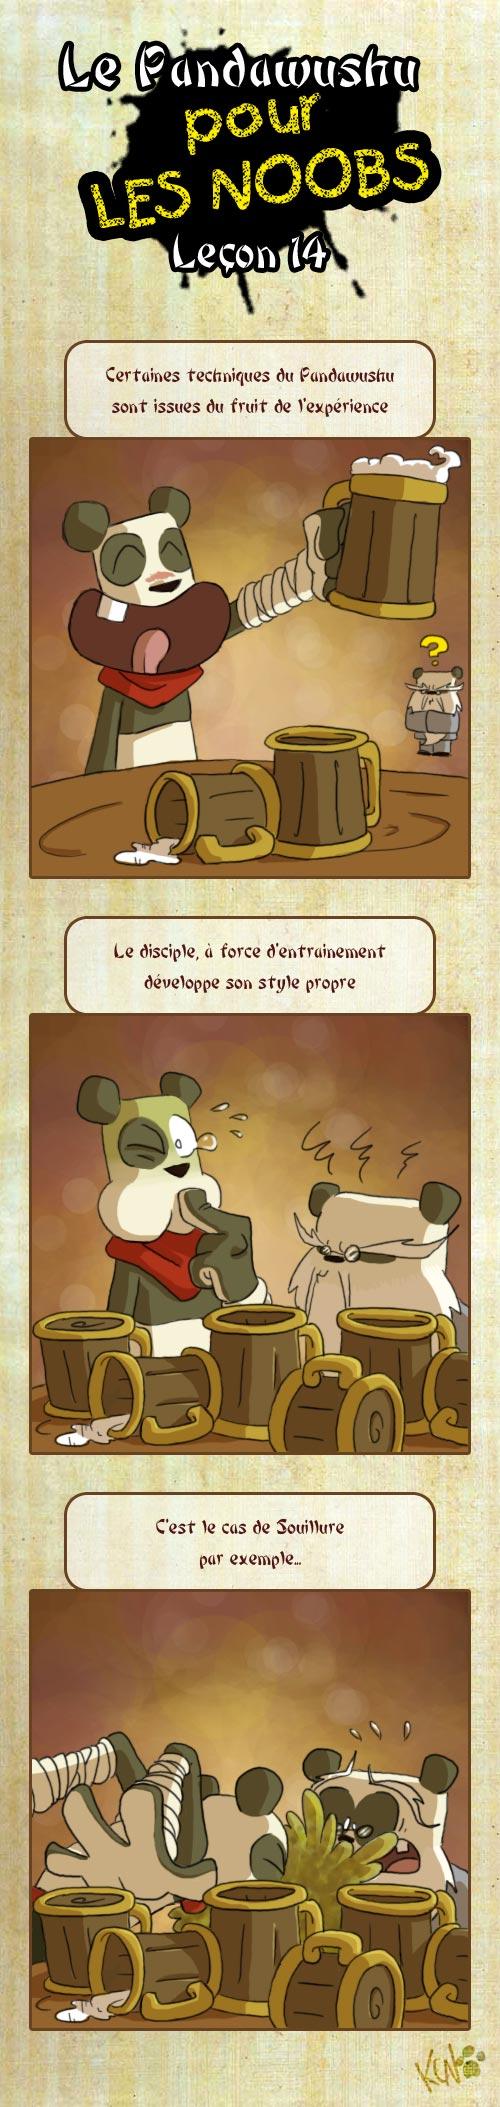 Le Pandawushu pour les Noobs Pandawushu14